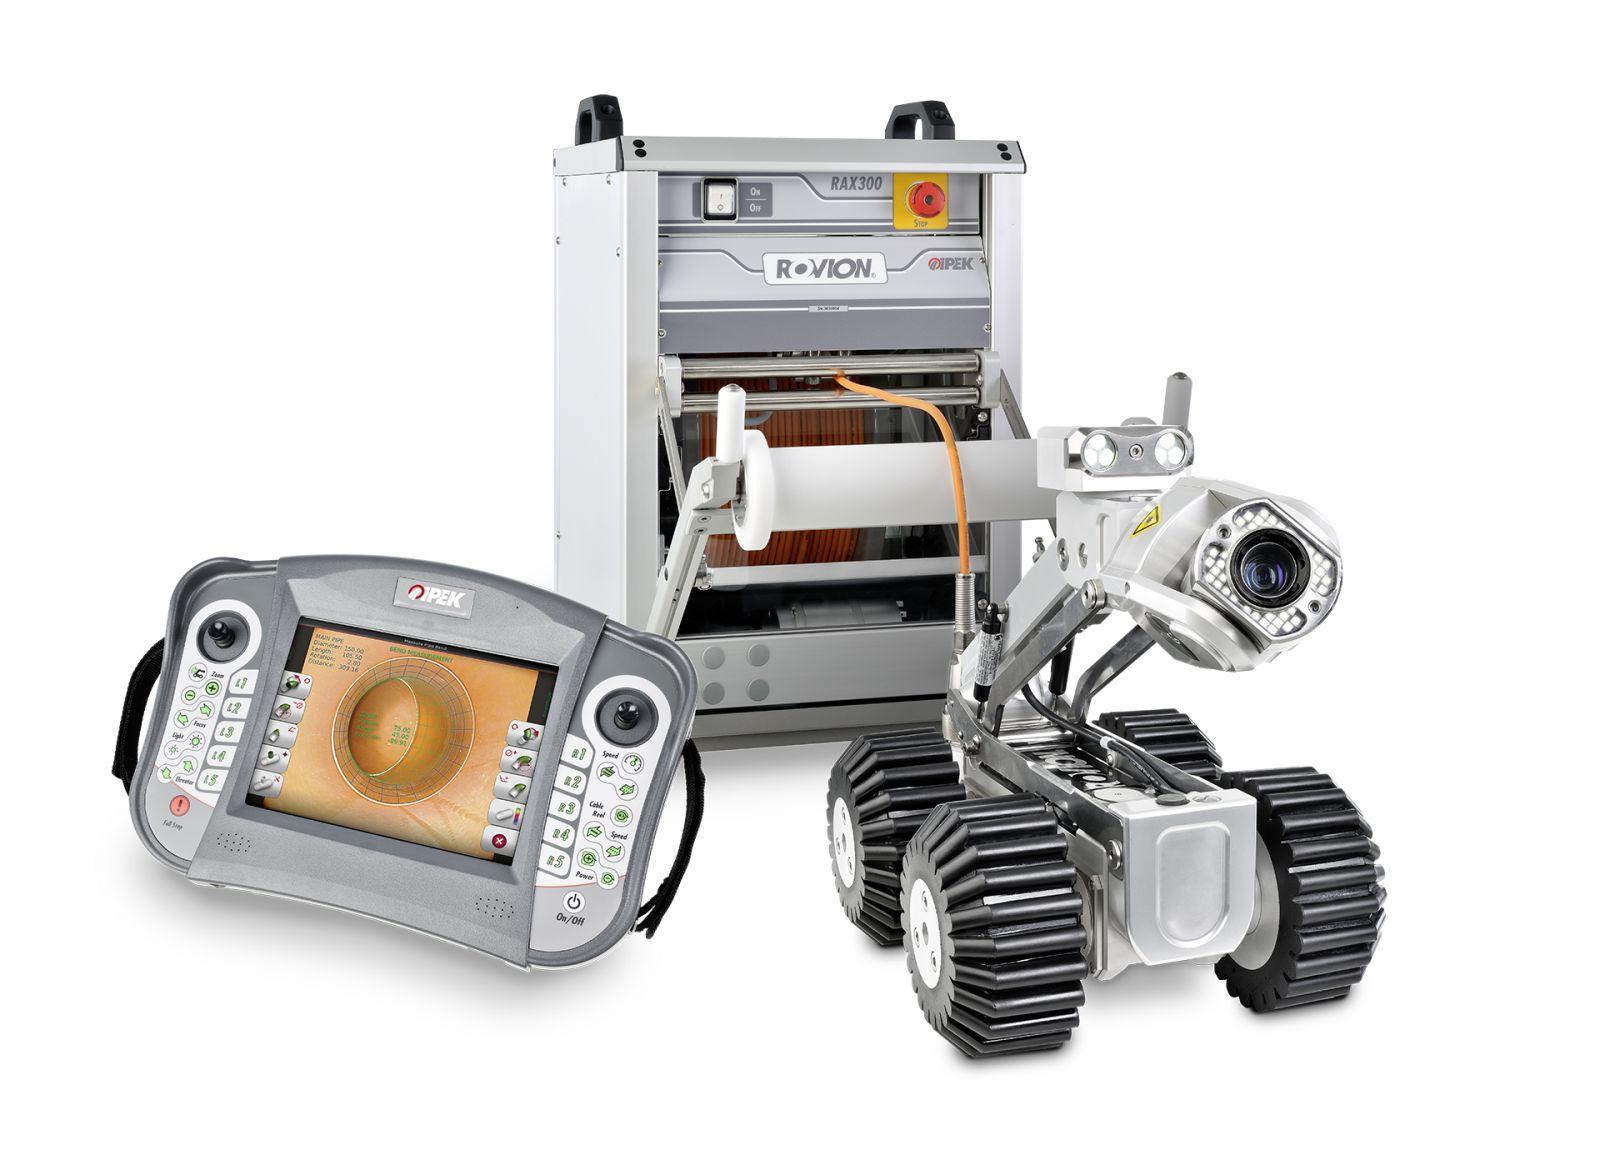 Equipos para la inspección robotizada de tuberías con cámara TV